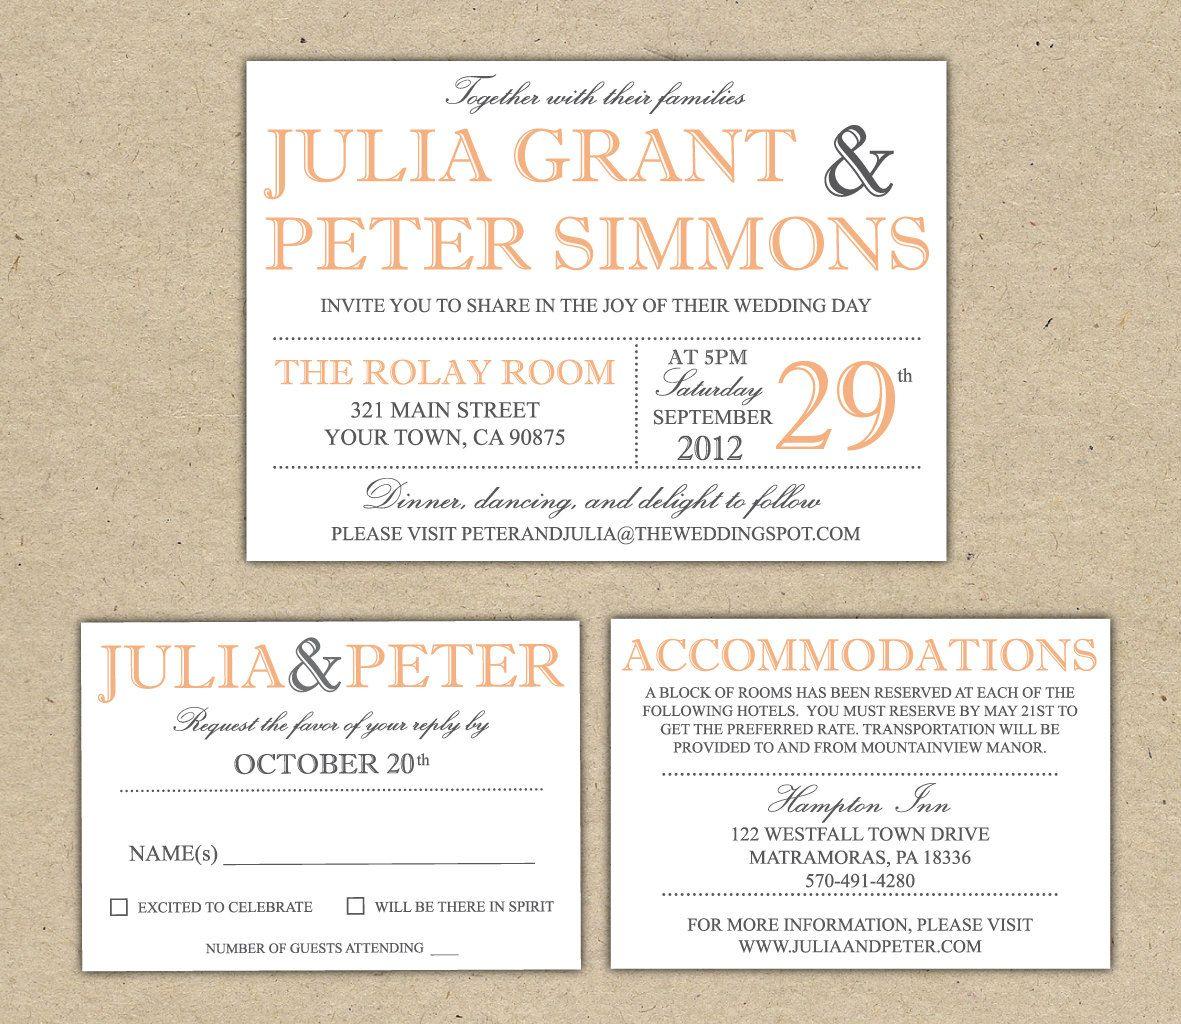 Wedding Invitation Invitations Pinterest Diy Wedding - Wedding invitation templates: hotel accommodations template for wedding invitations